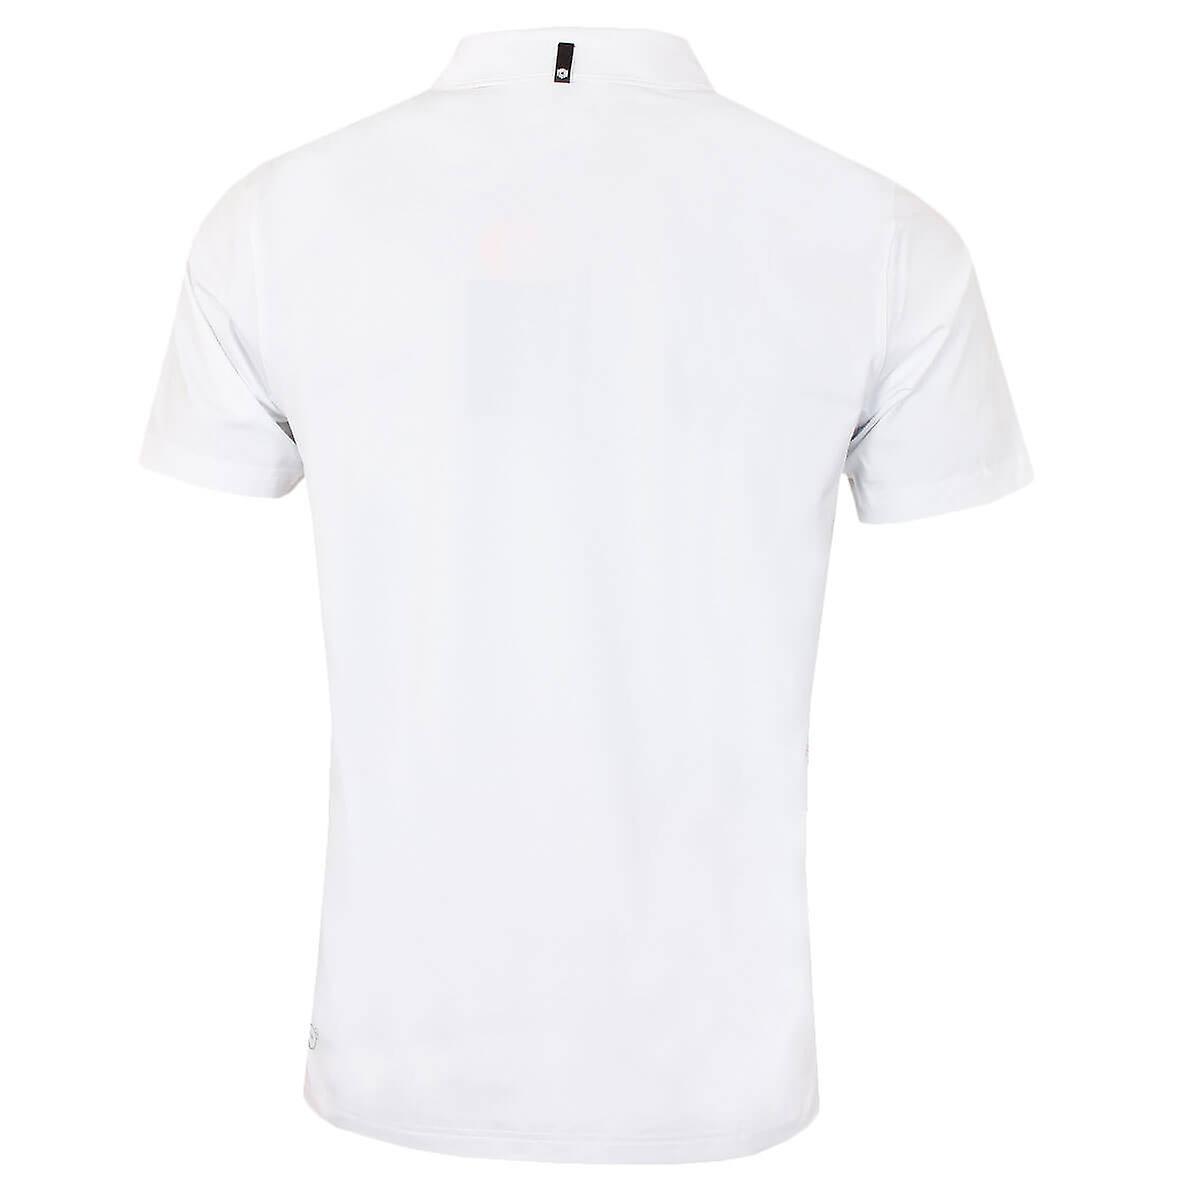 b6399f23a3 Puma Golf Mens Turf Stripe Golf Polo Shirt